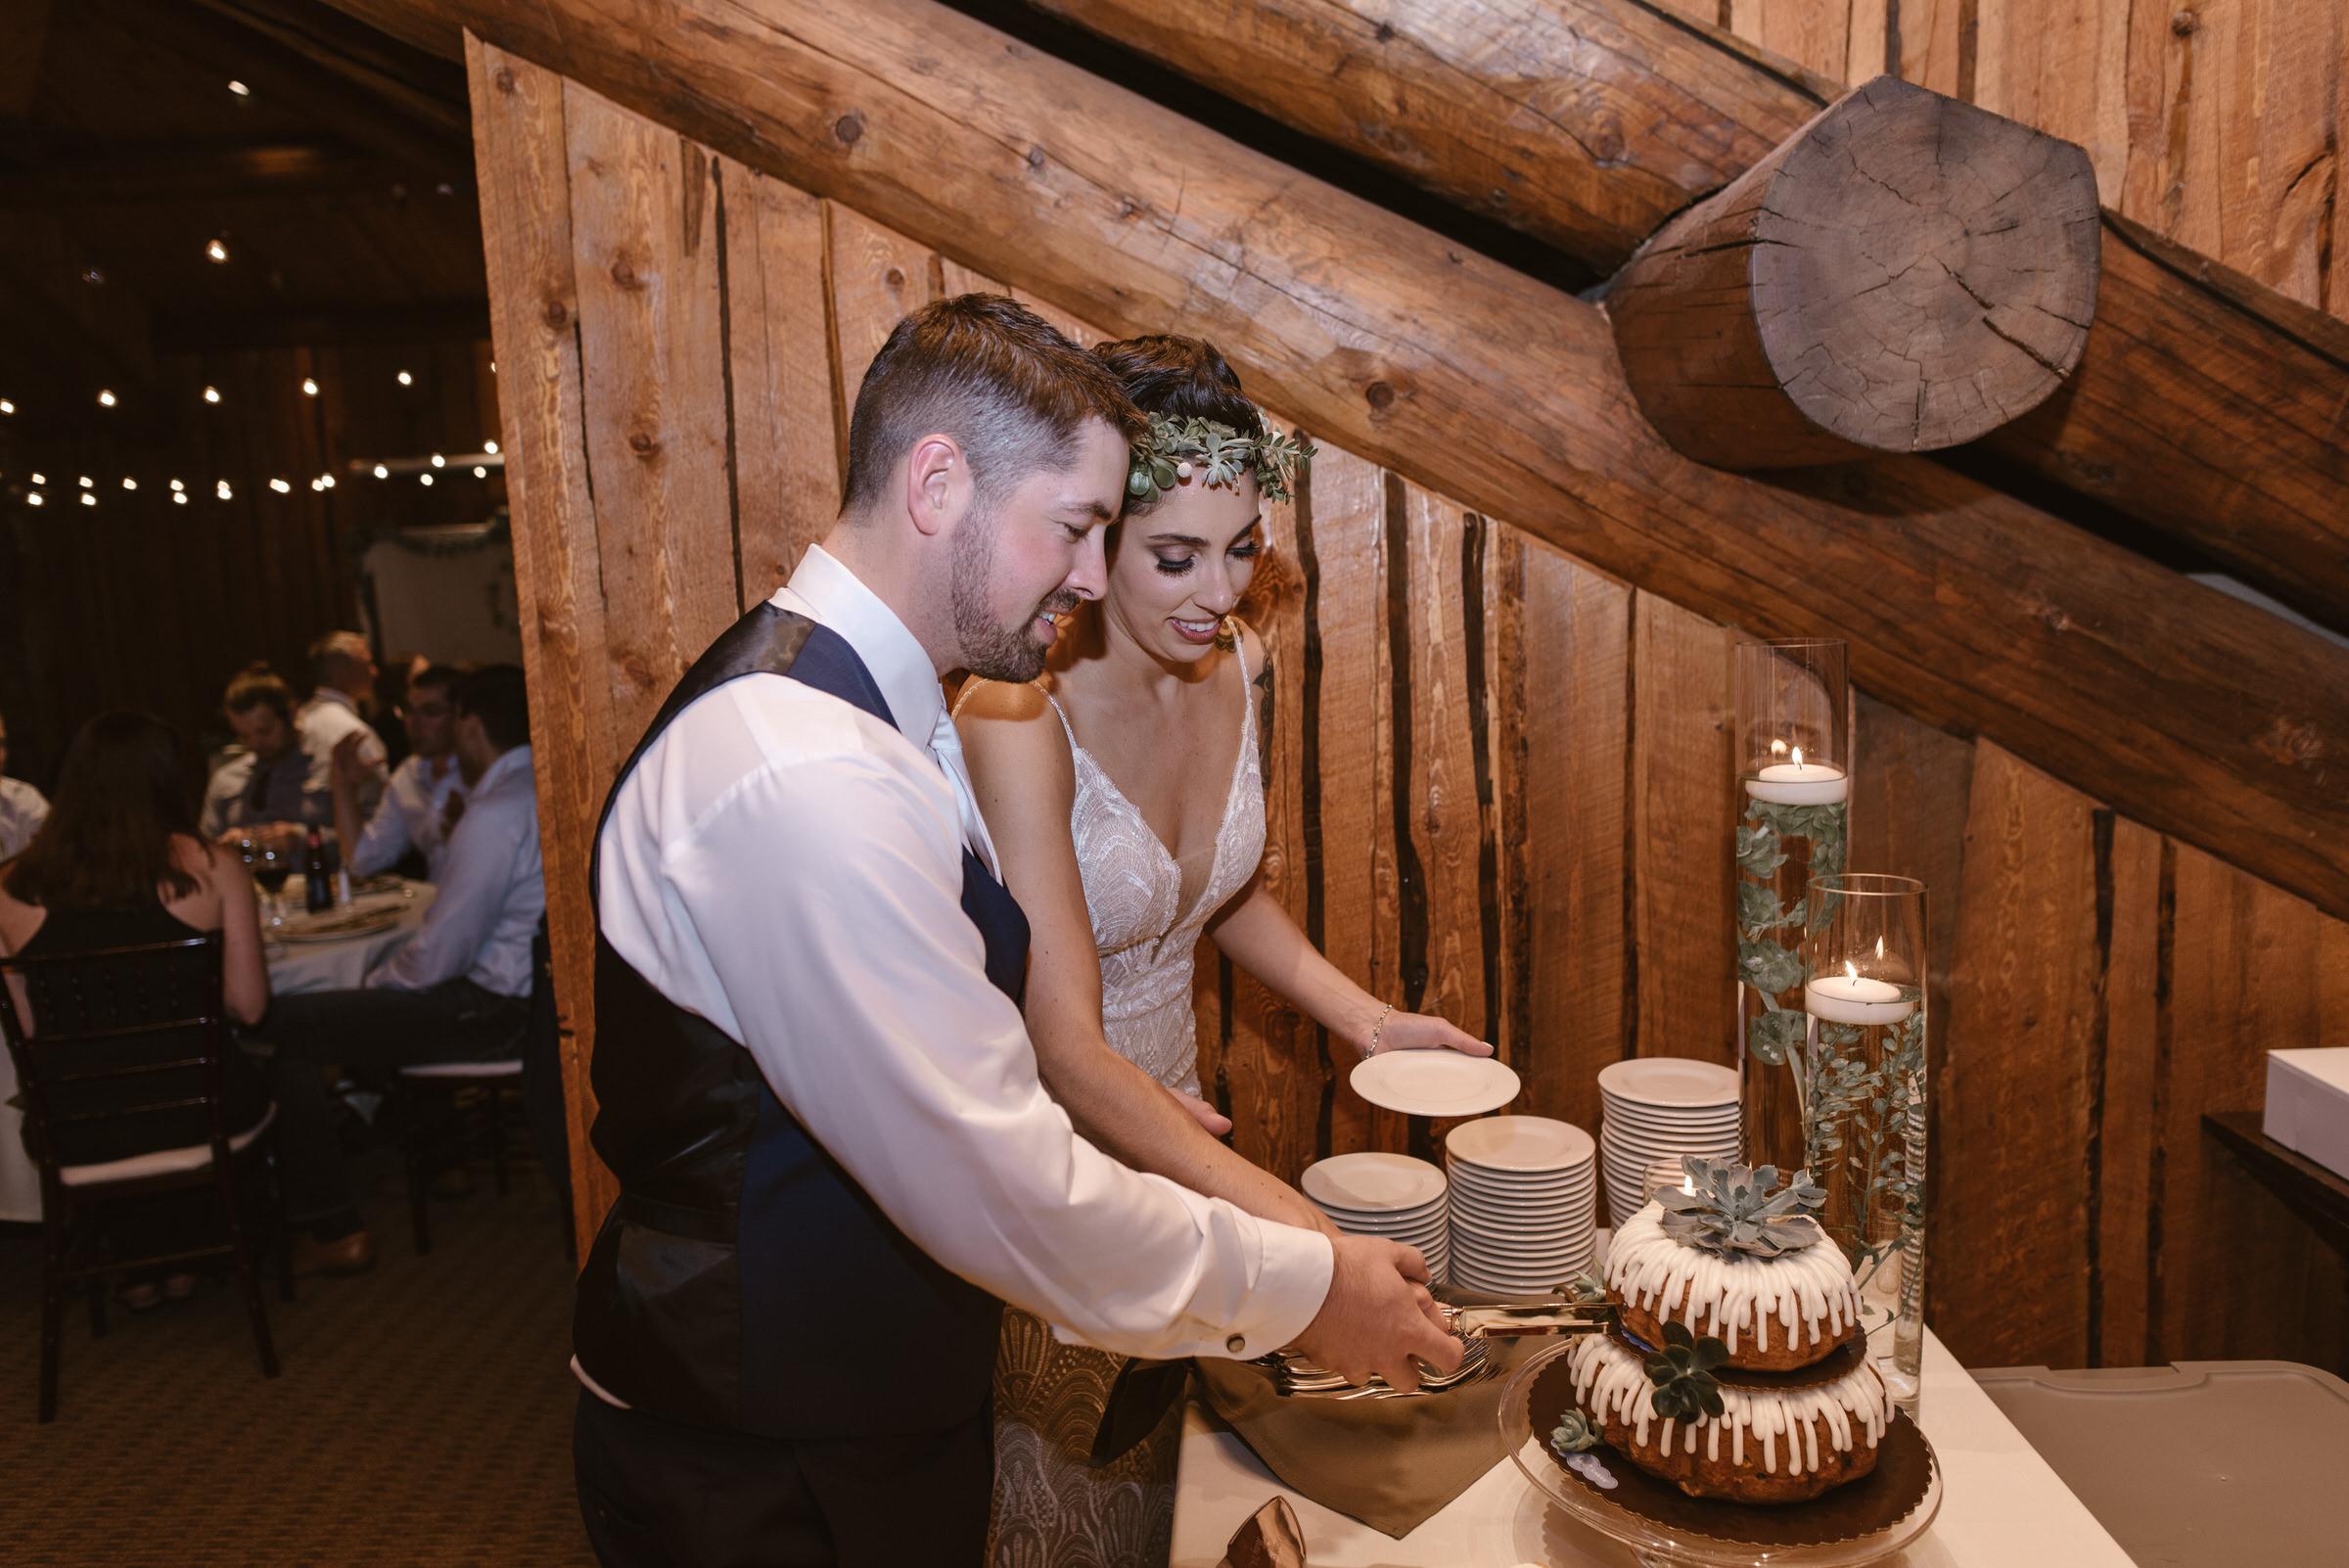 Wilderness-Ridge-Lincoln-Nebraska-Wedding-Kaylie-Sirek-Photography-114.jpg